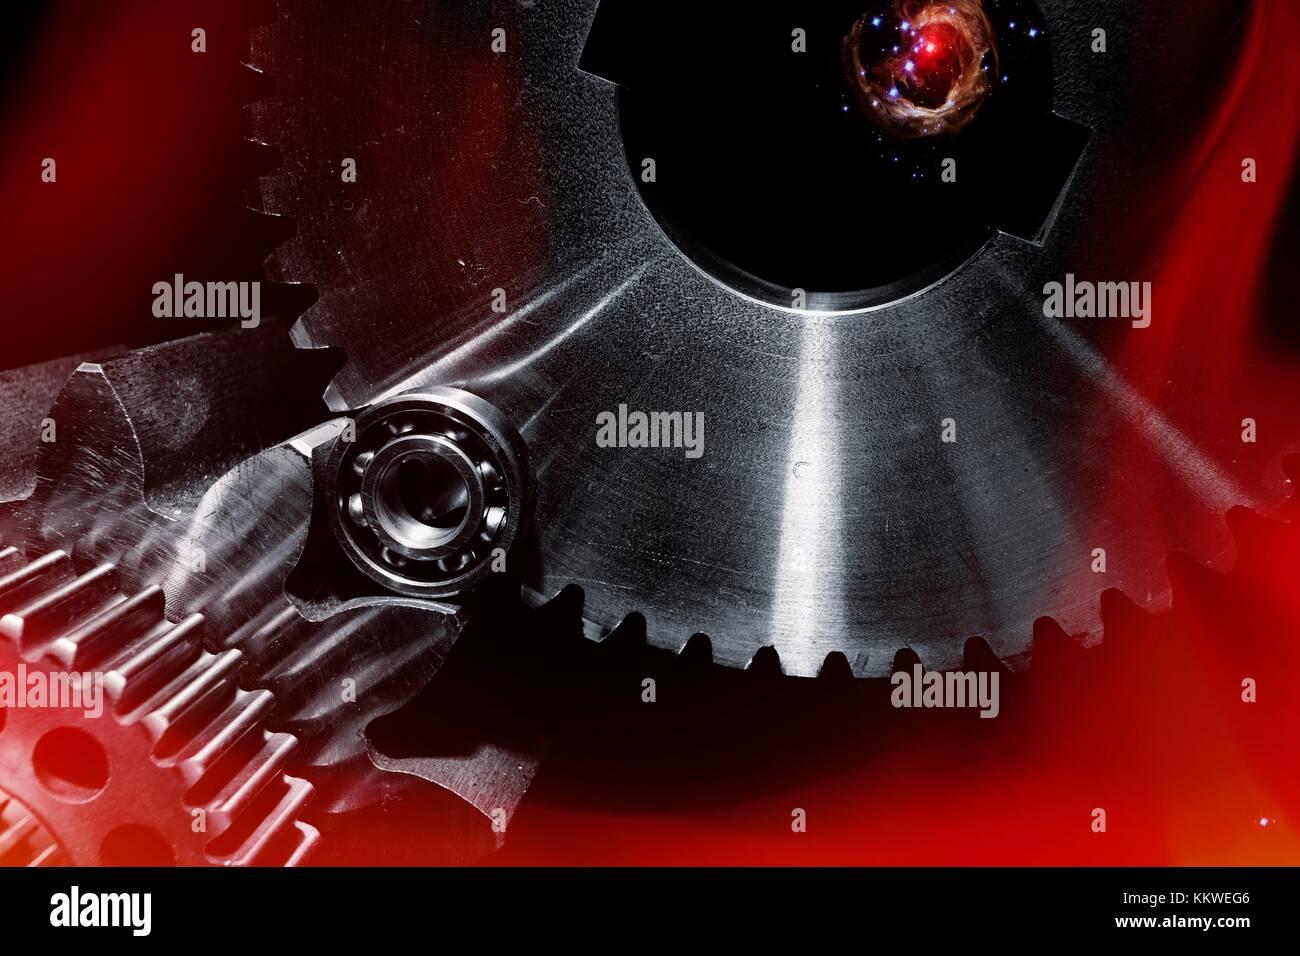 Titanium aerospace gears, conceptual composite image. - Stock Image